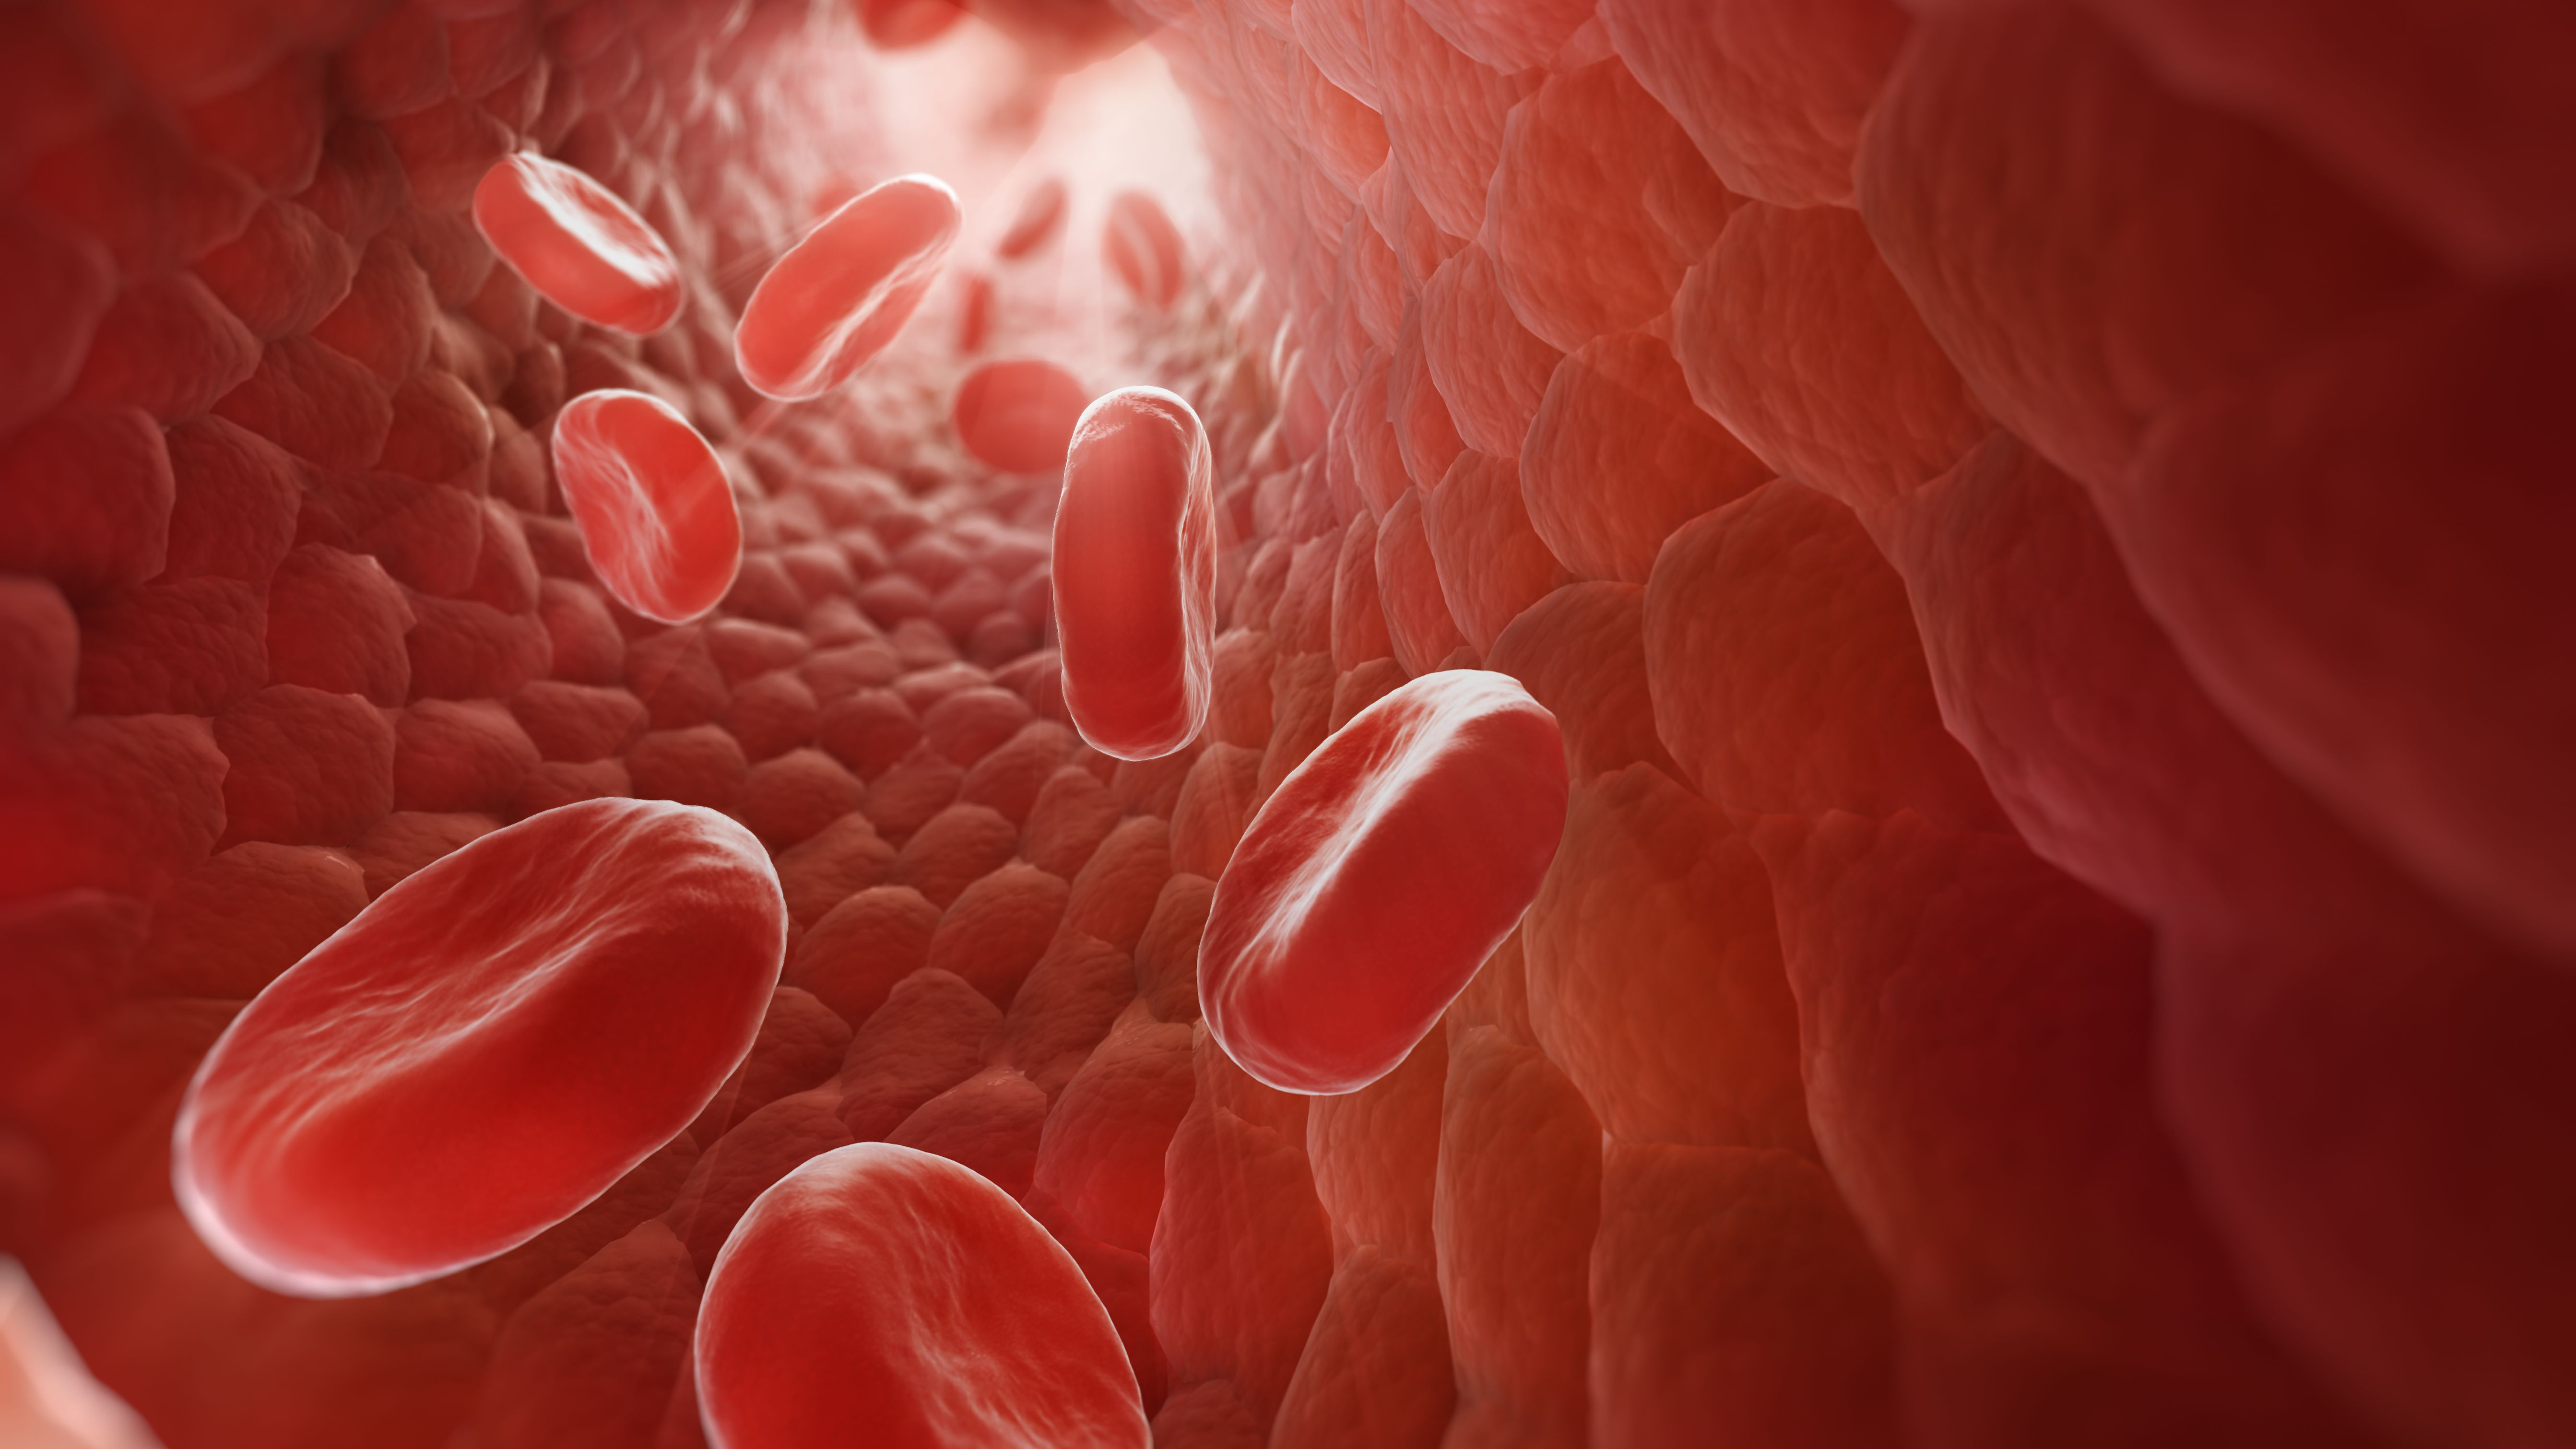 Implantation Bleeding Stories